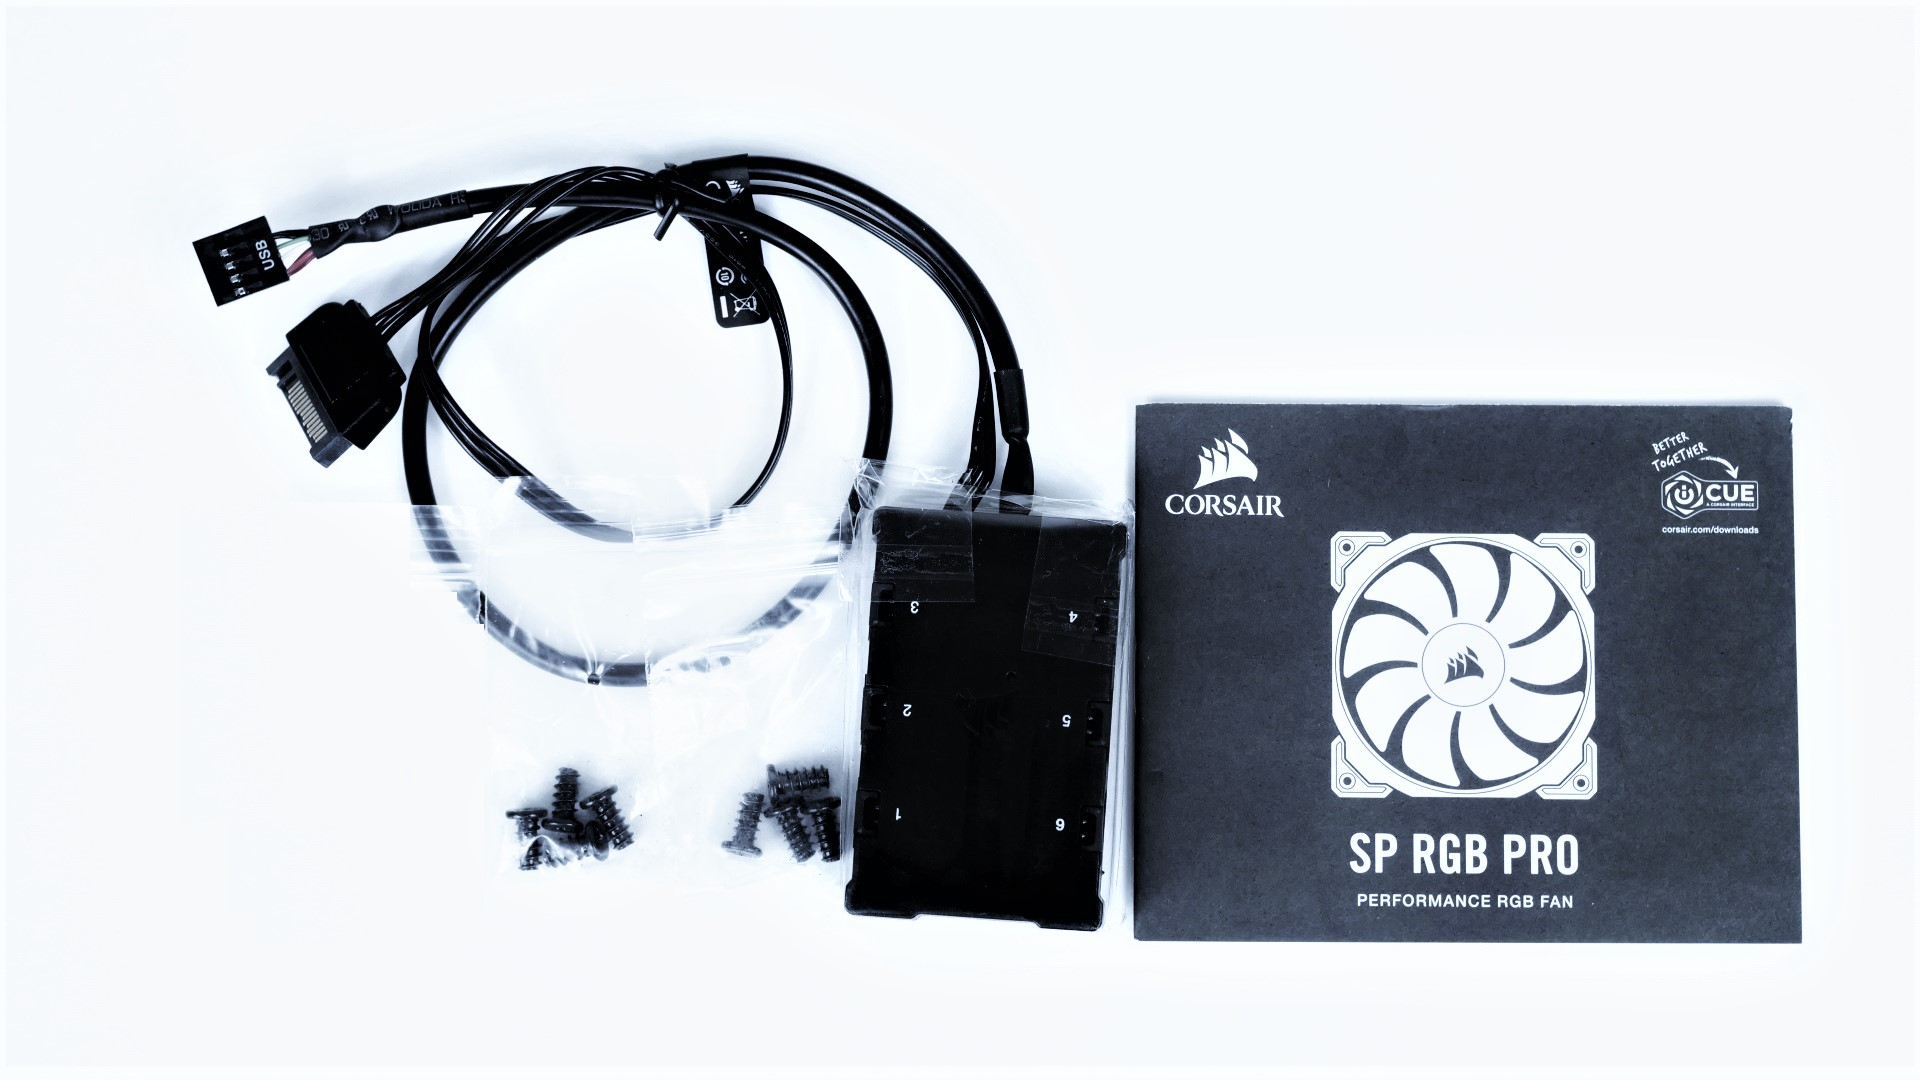 SP140 RGB PRO Performance-Bundle